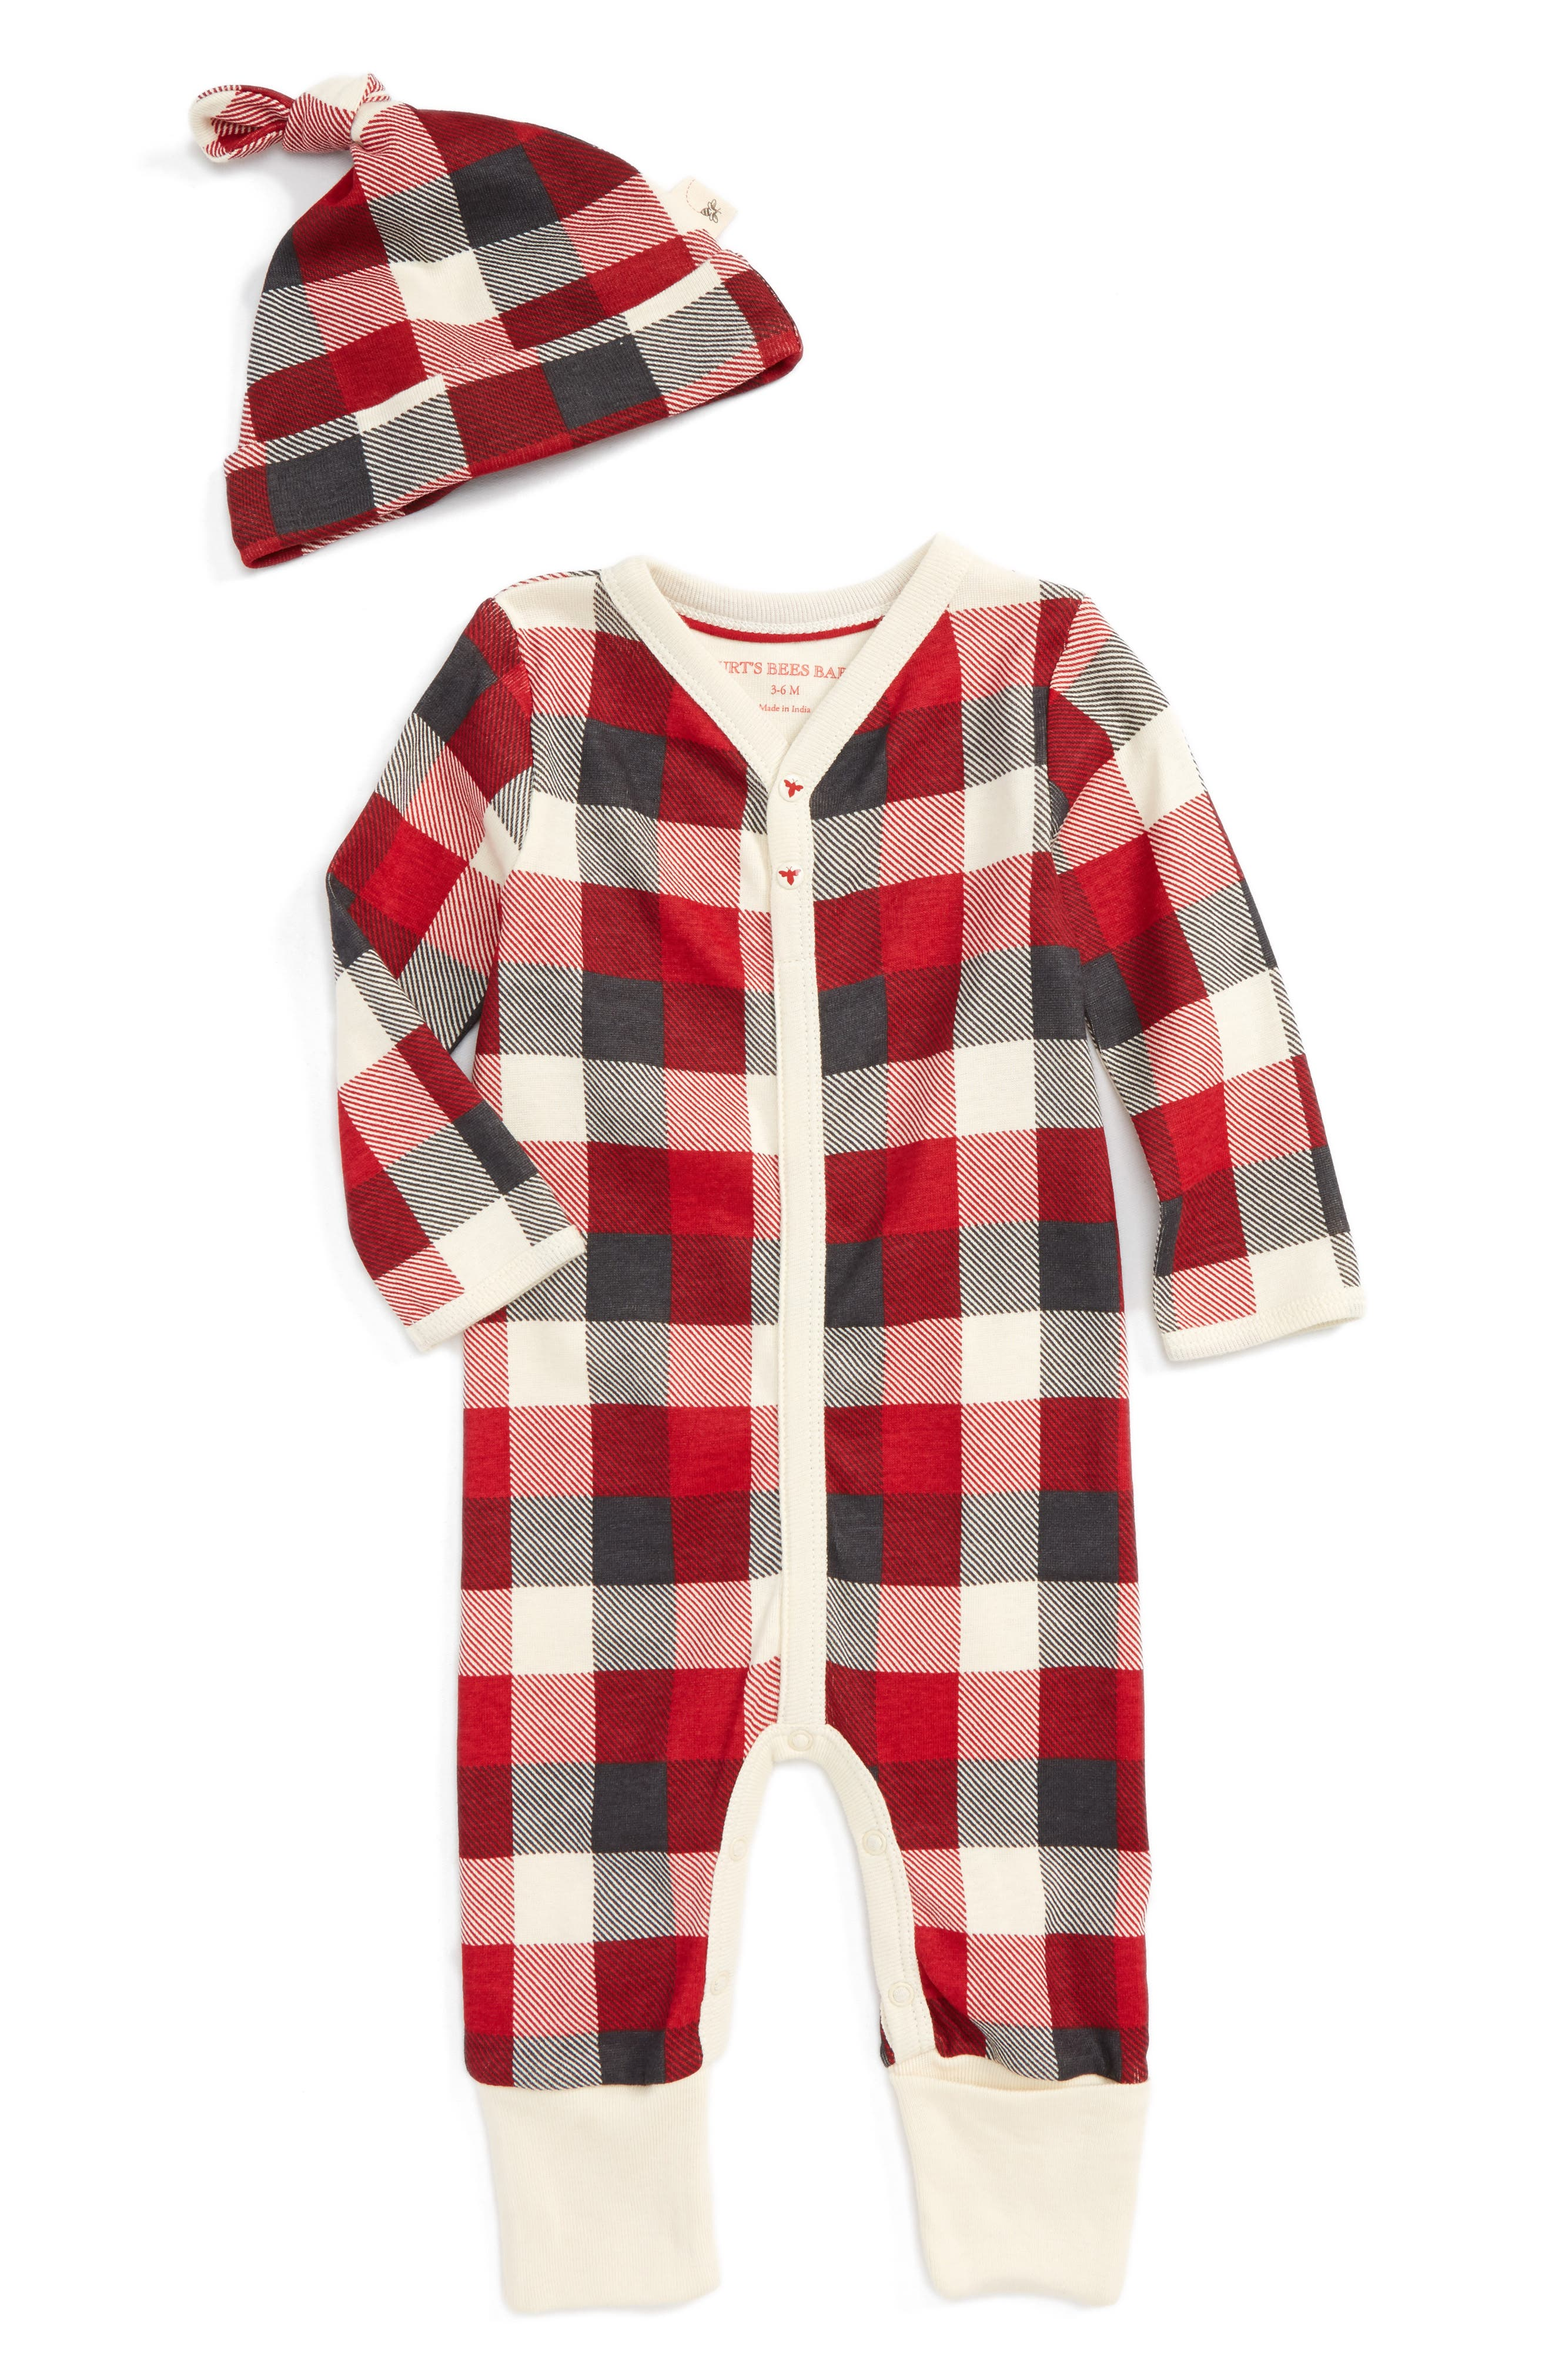 Alternate Image 1 Selected - Burt's Bees Baby Plaid Organic Cotton Romper & Hat Set (Baby)